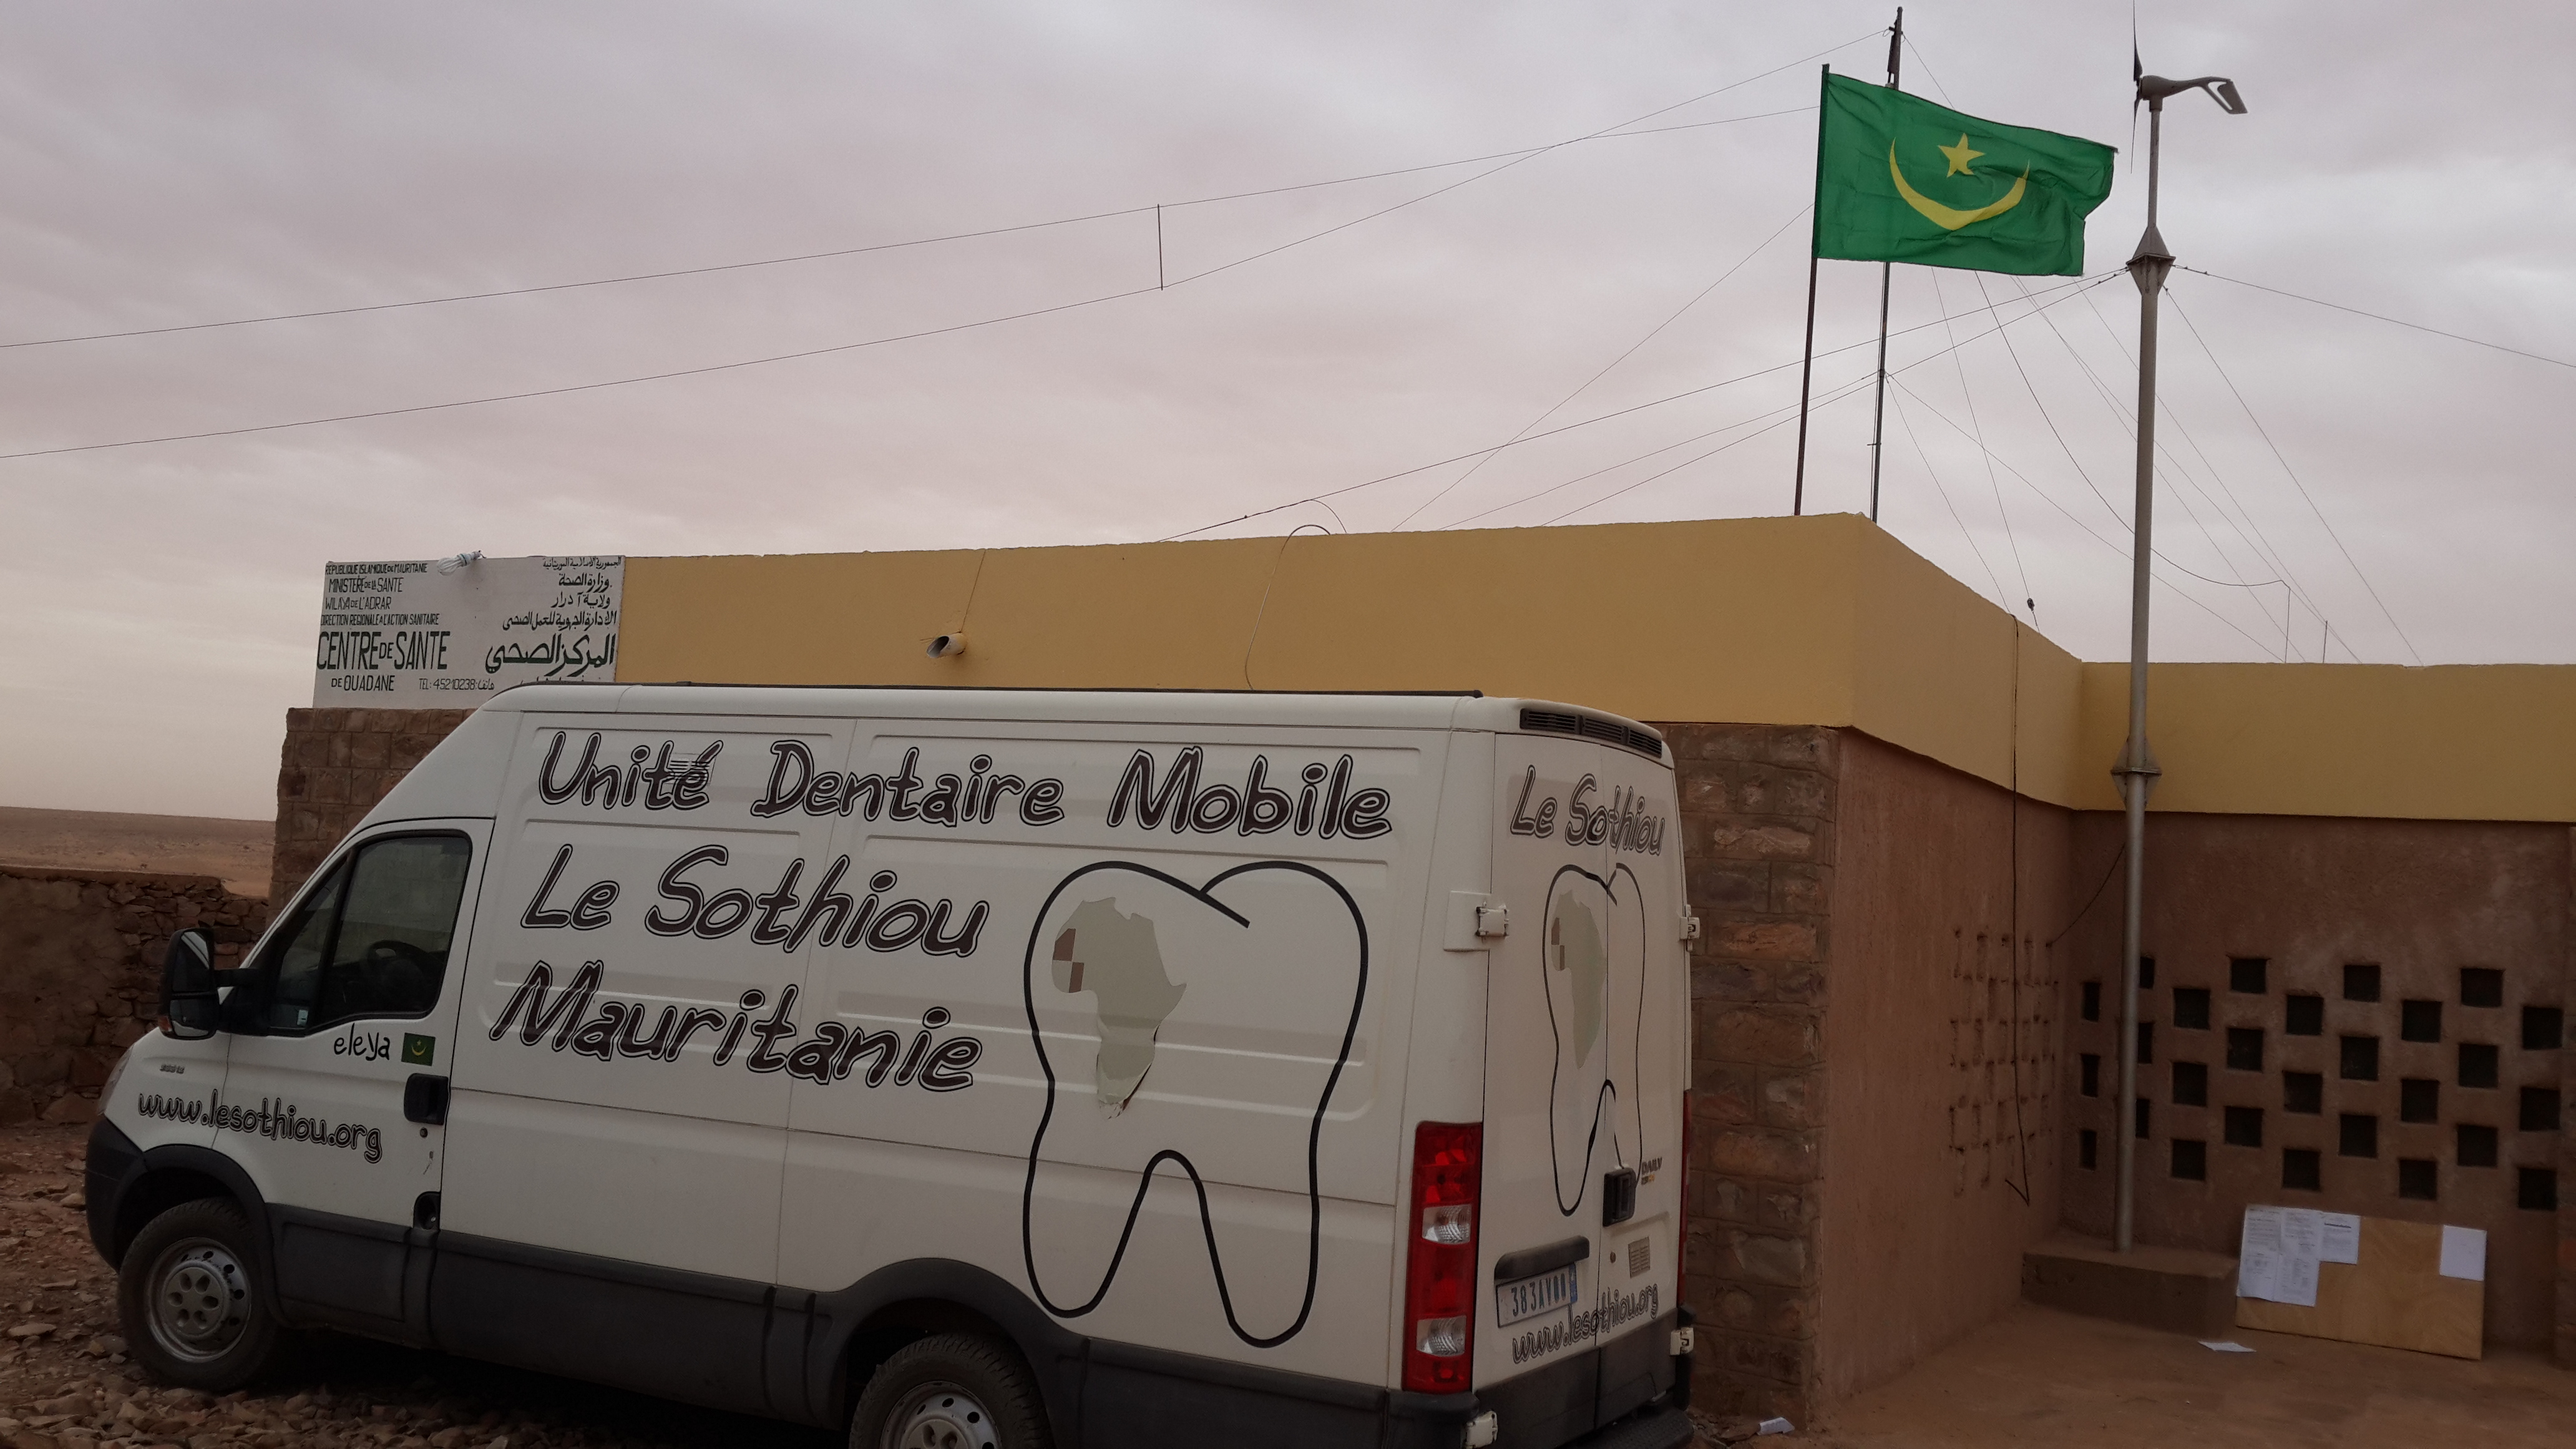 Camion dentaire le Sothiou